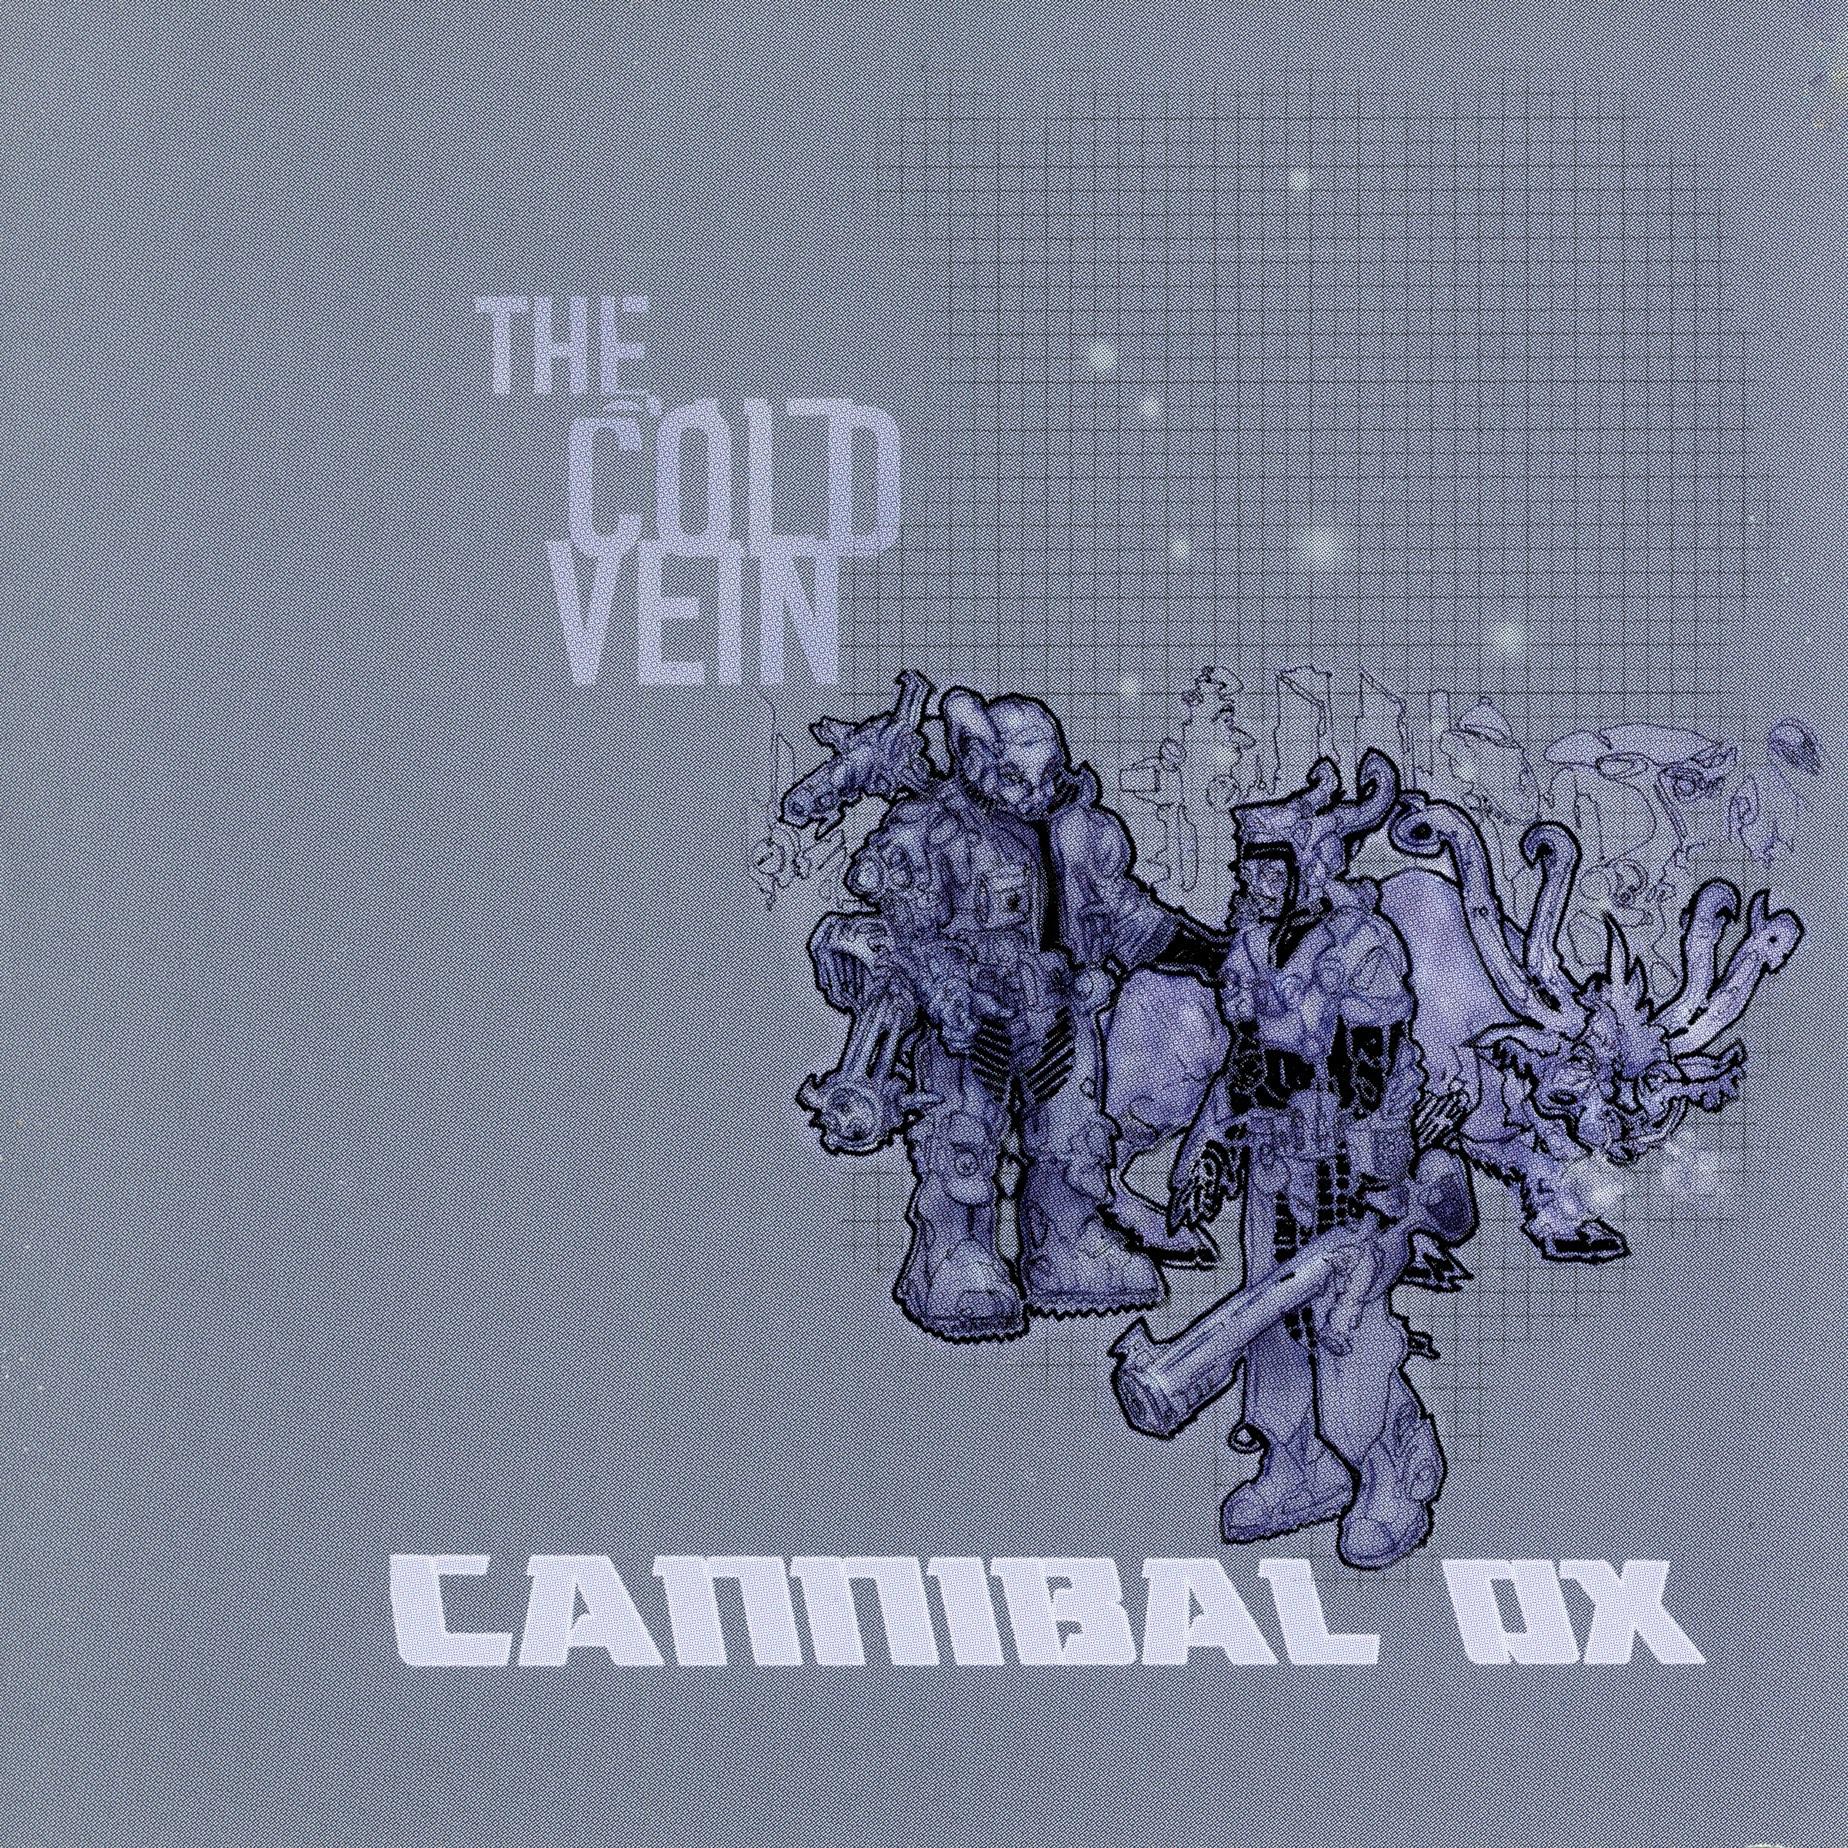 2001 - Cannibal Ox